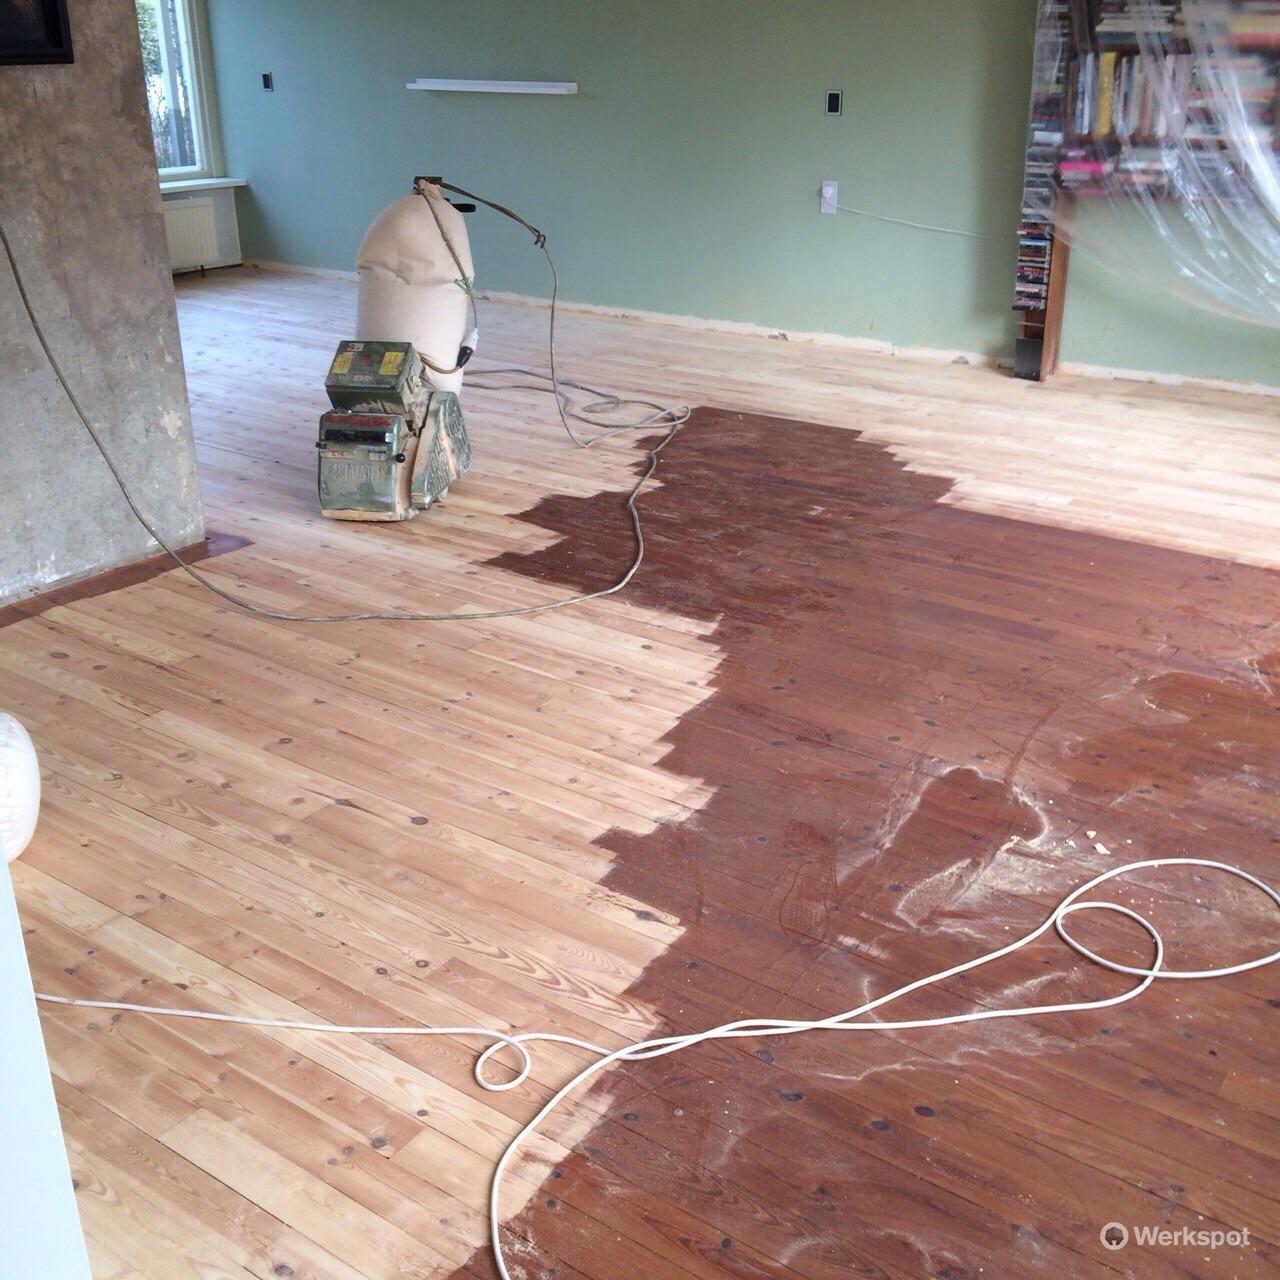 grenen vloer 51 m2 schuren en lakken of olien werkspot